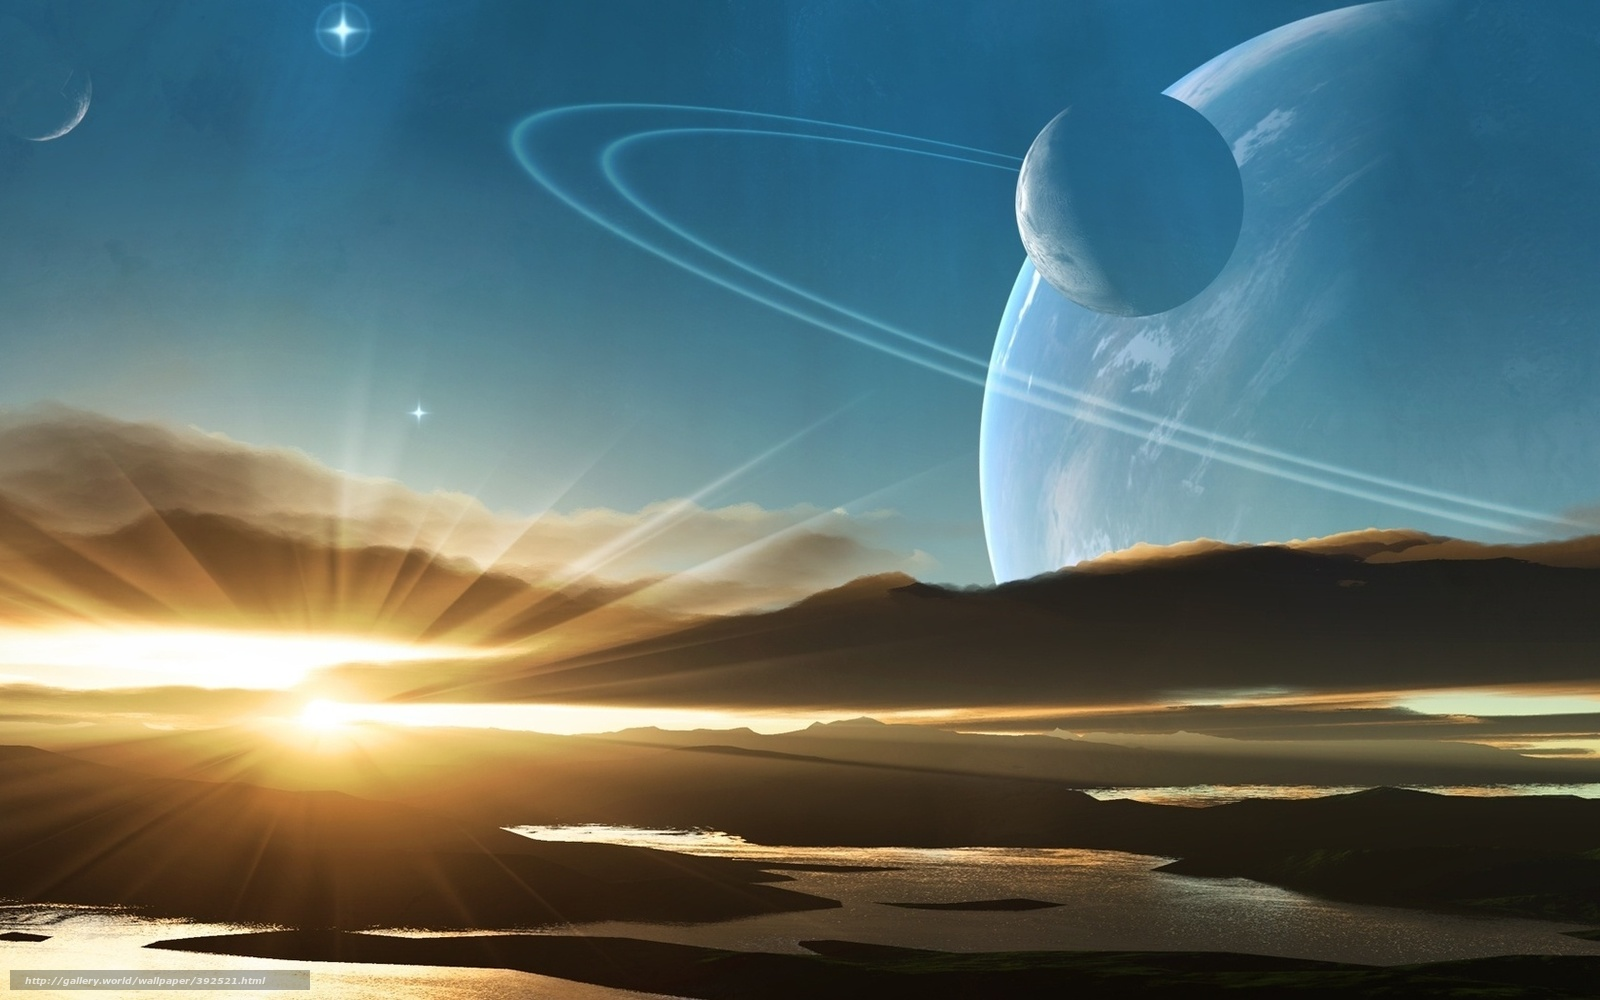 Alien World Wallpaper - WallpaperSafari